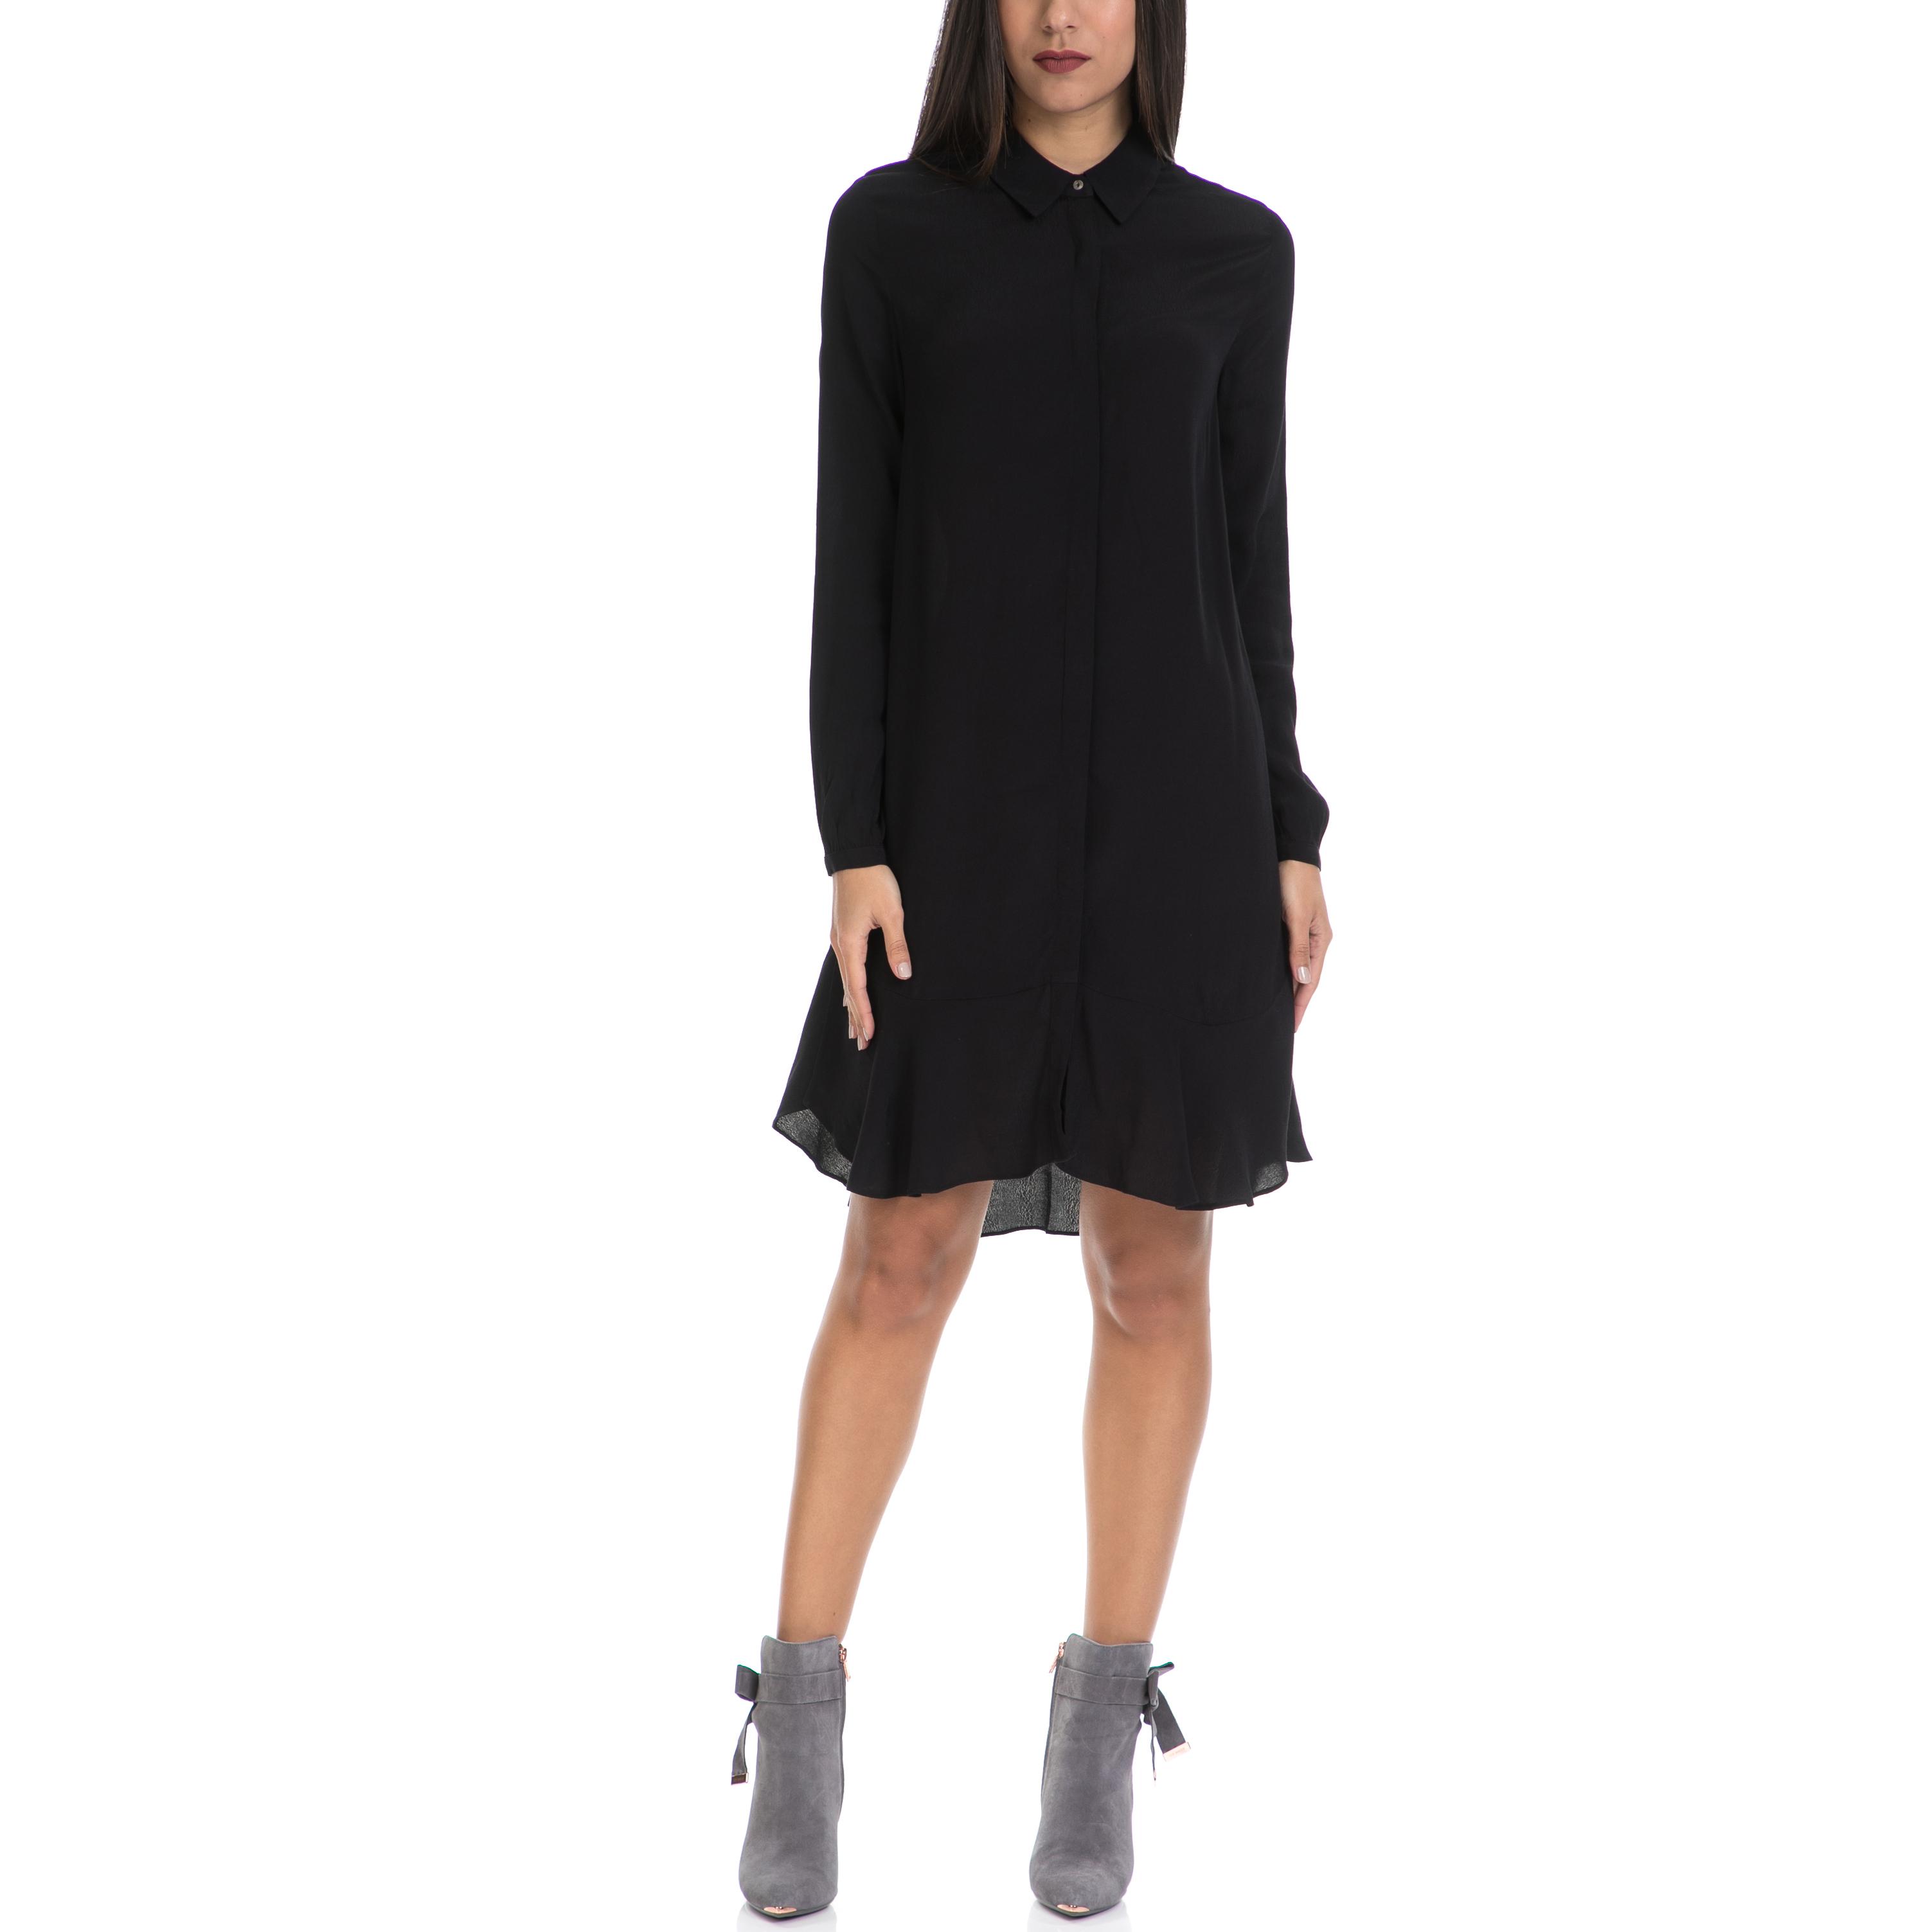 MAISON SCOTCH - Γυναικείο φόρεμα MAISON SCOTCH μαύρο γυναικεία ρούχα φορέματα μίνι